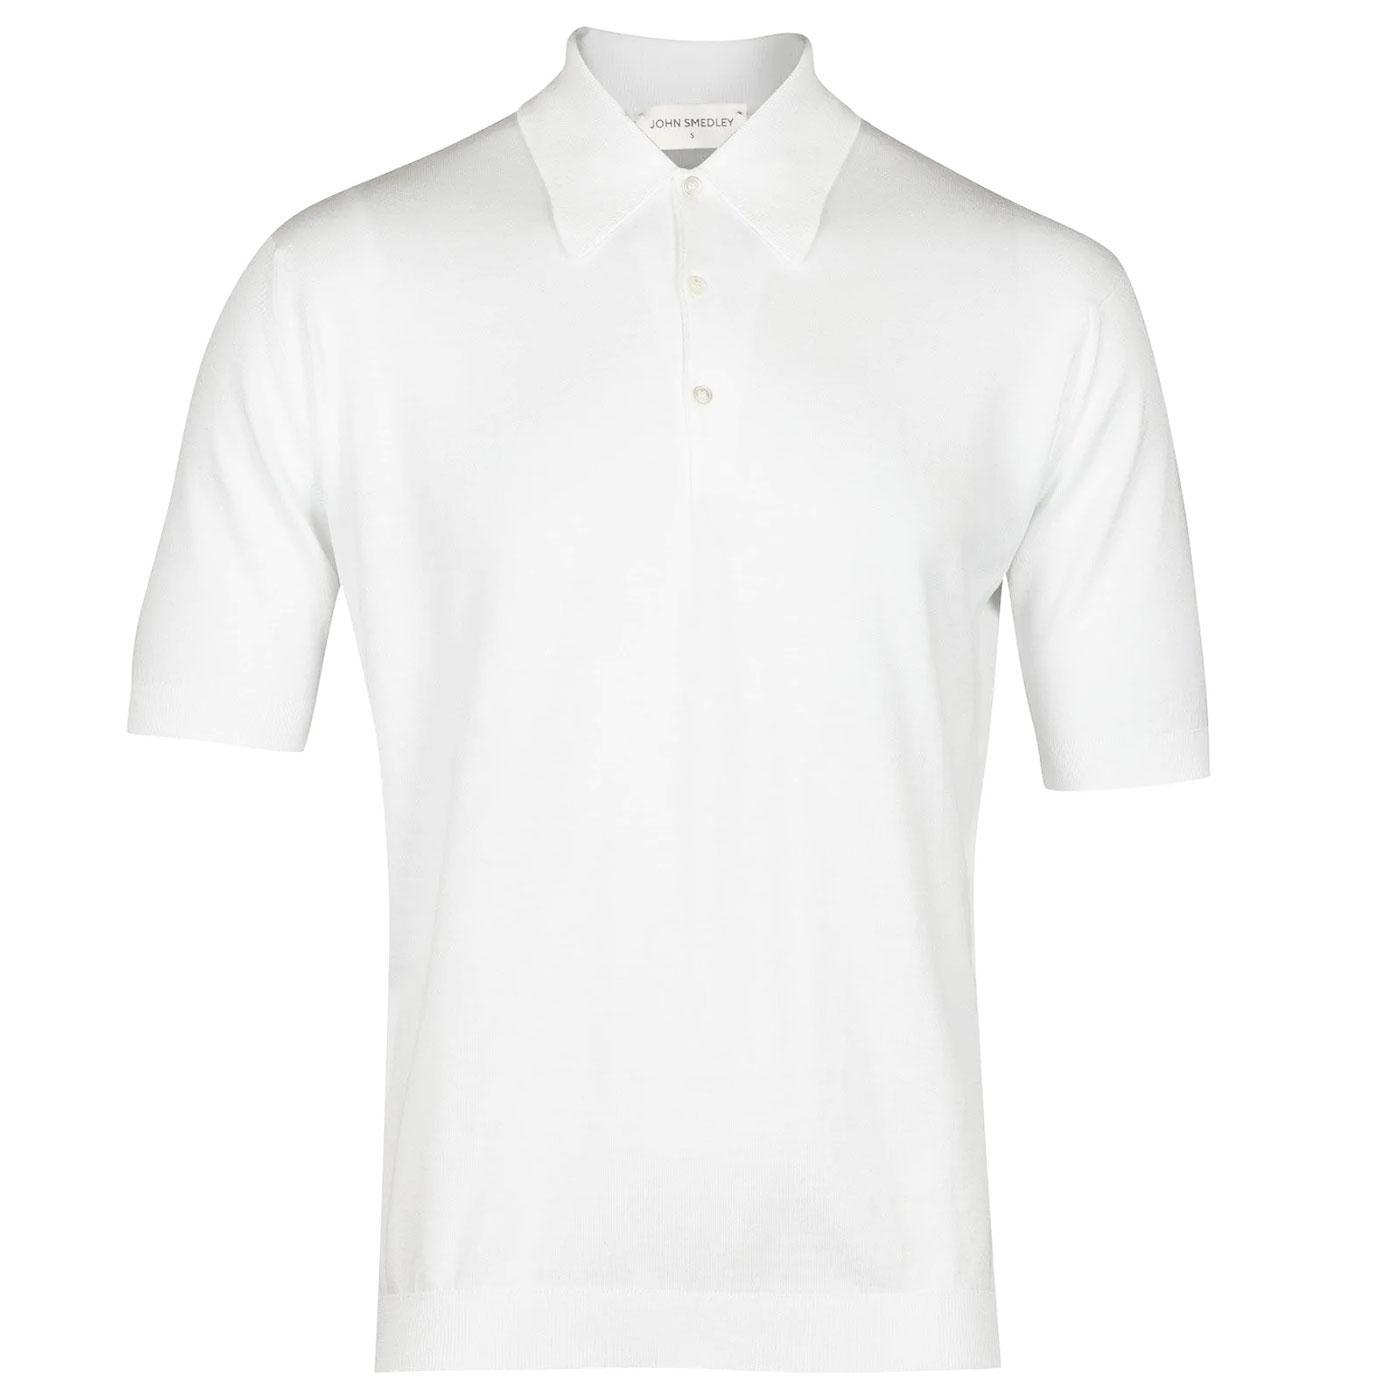 Isis JOHN SMEDLEY Retro Knitted Mod Polo Shirt W